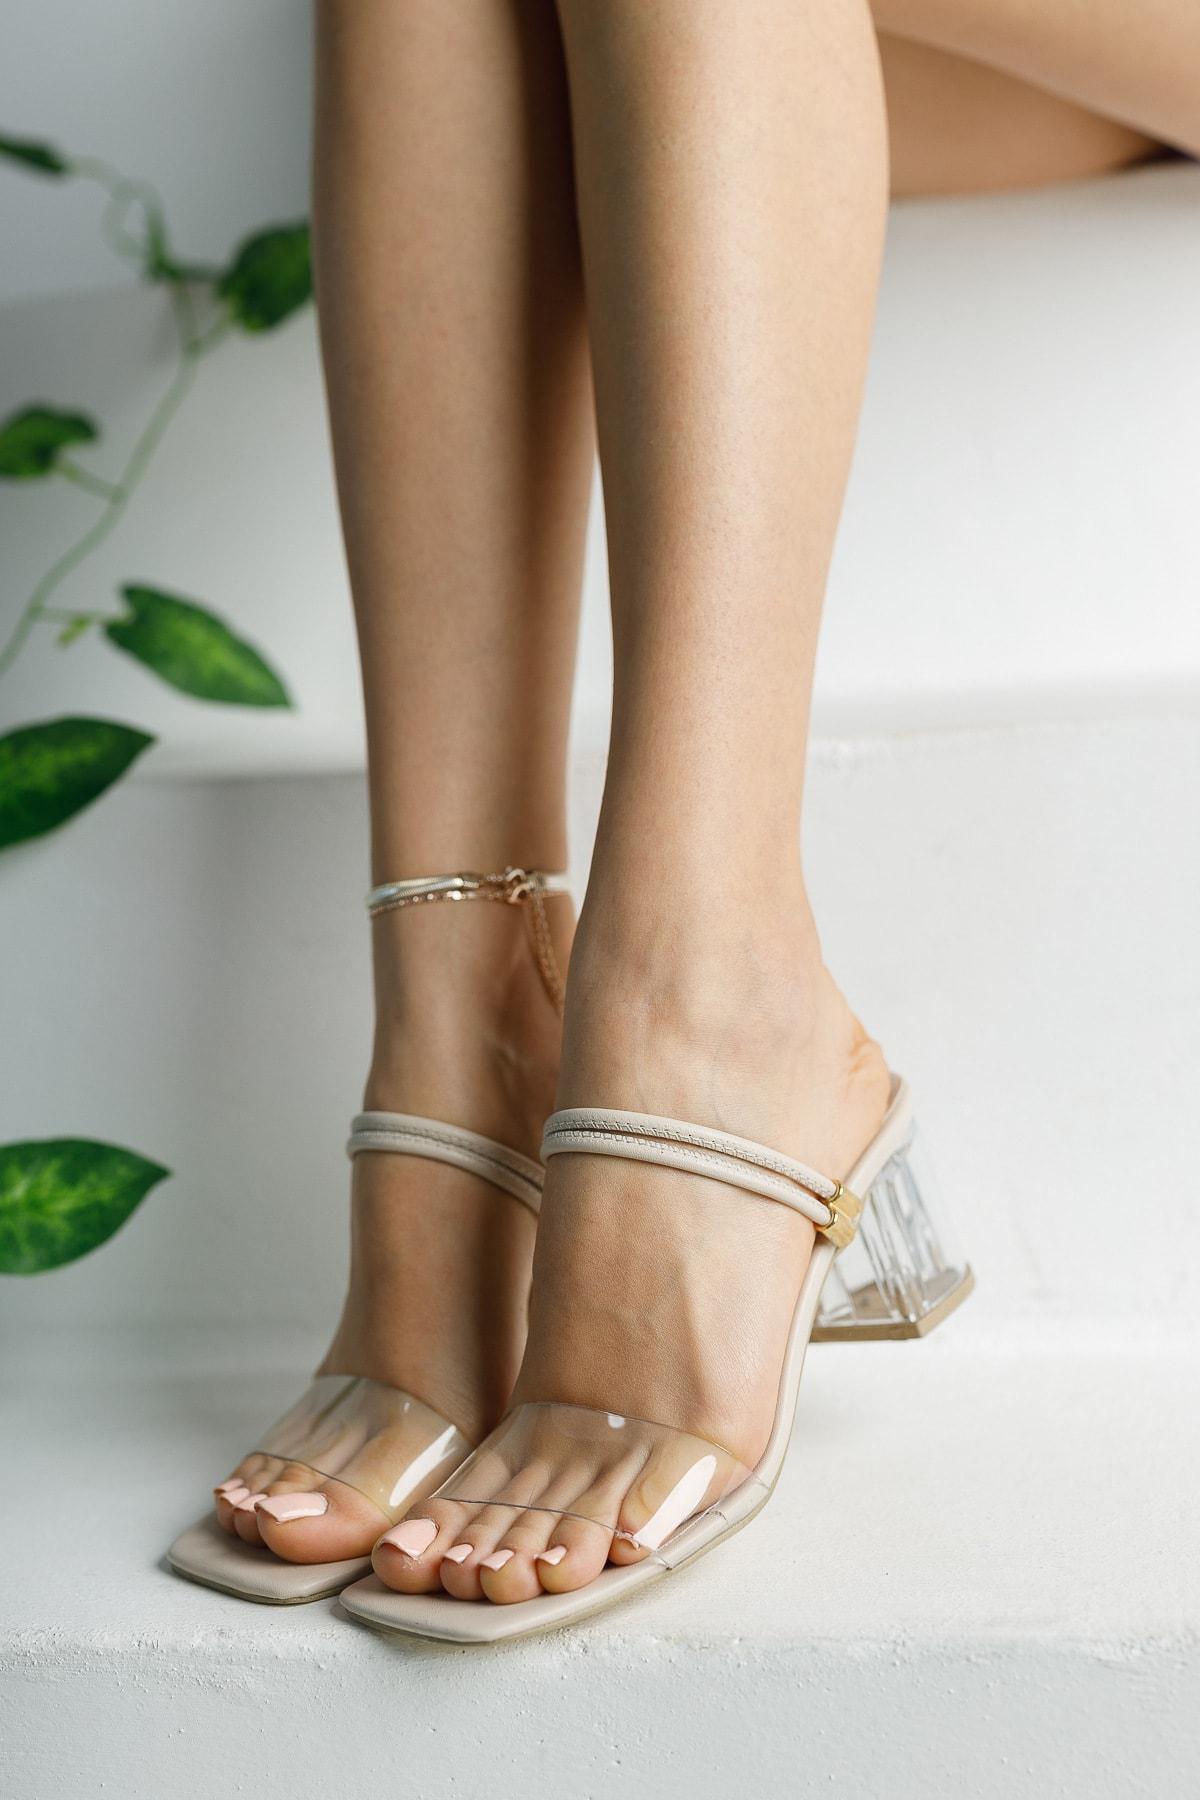 پاشنه بلند زنانه ترک جدید برند meyranın ayakkabıları رنگ بژ کد ty99096307